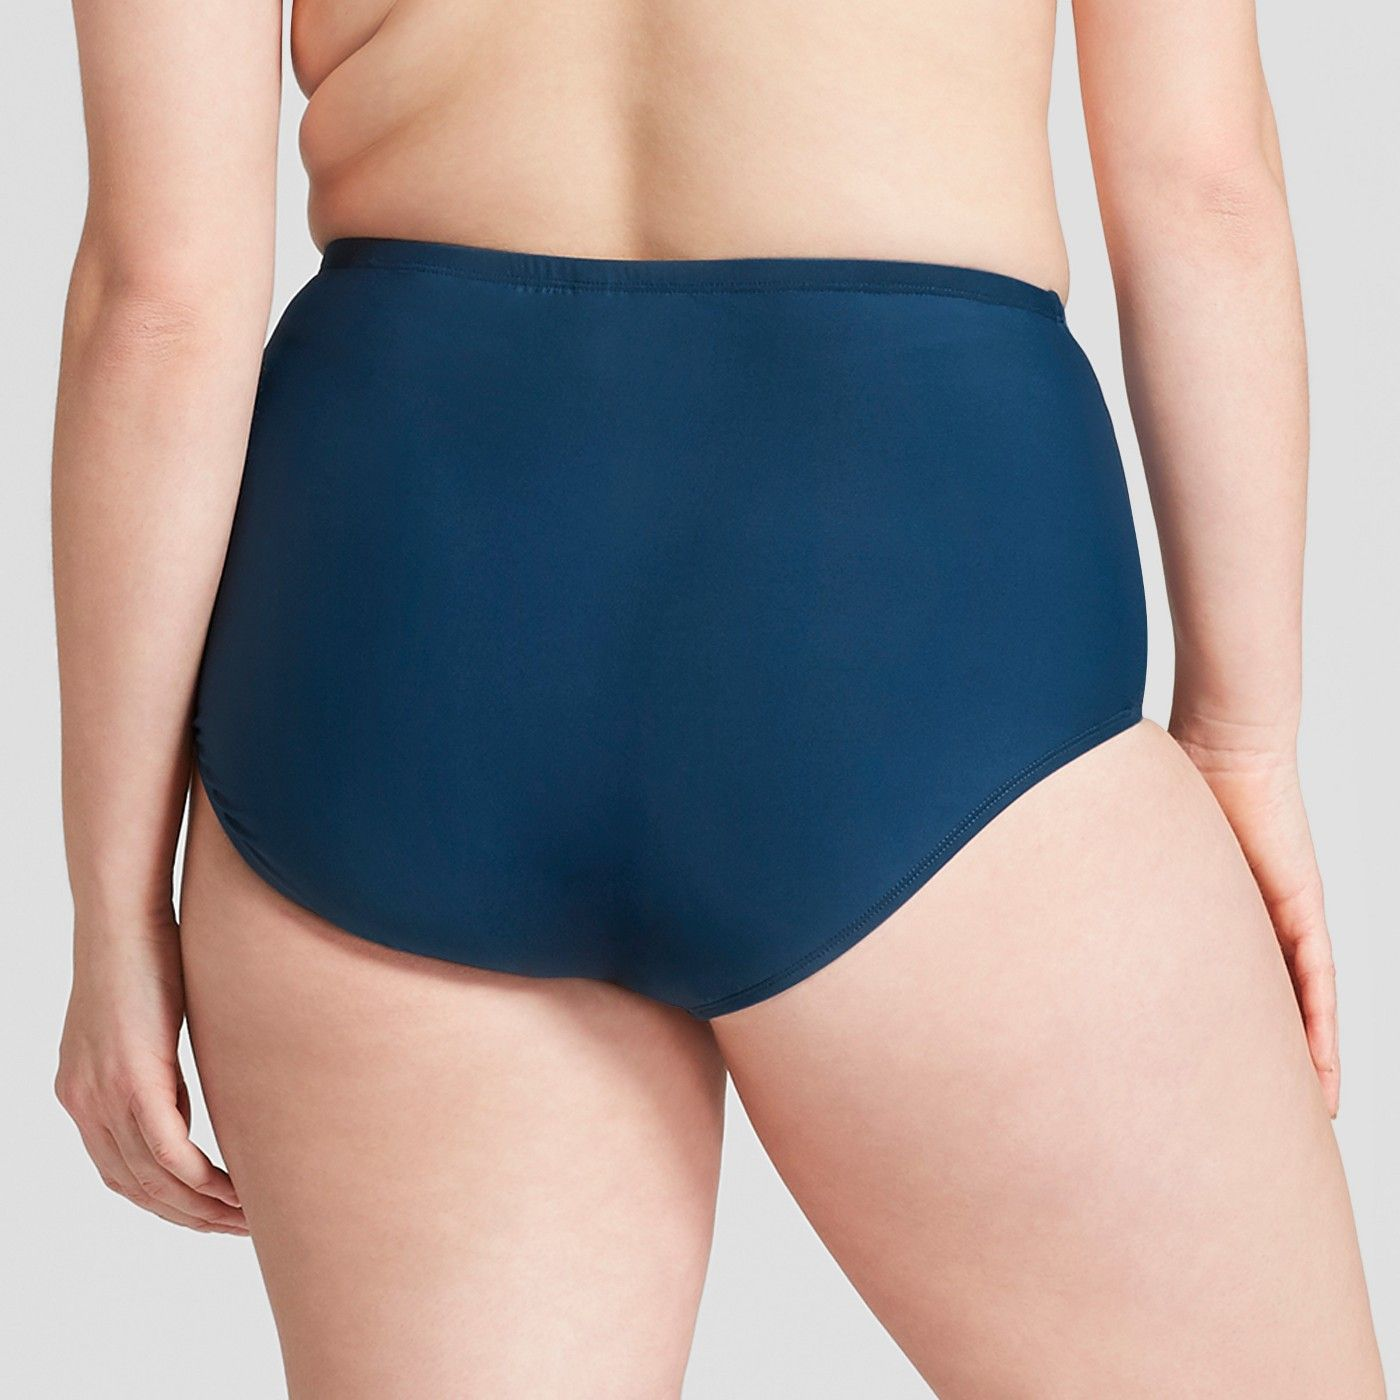 6af3c346f7 Social Angel Women's Plus High Waist Bikini Bottom - Navy 1X #Women, #High,  #Social